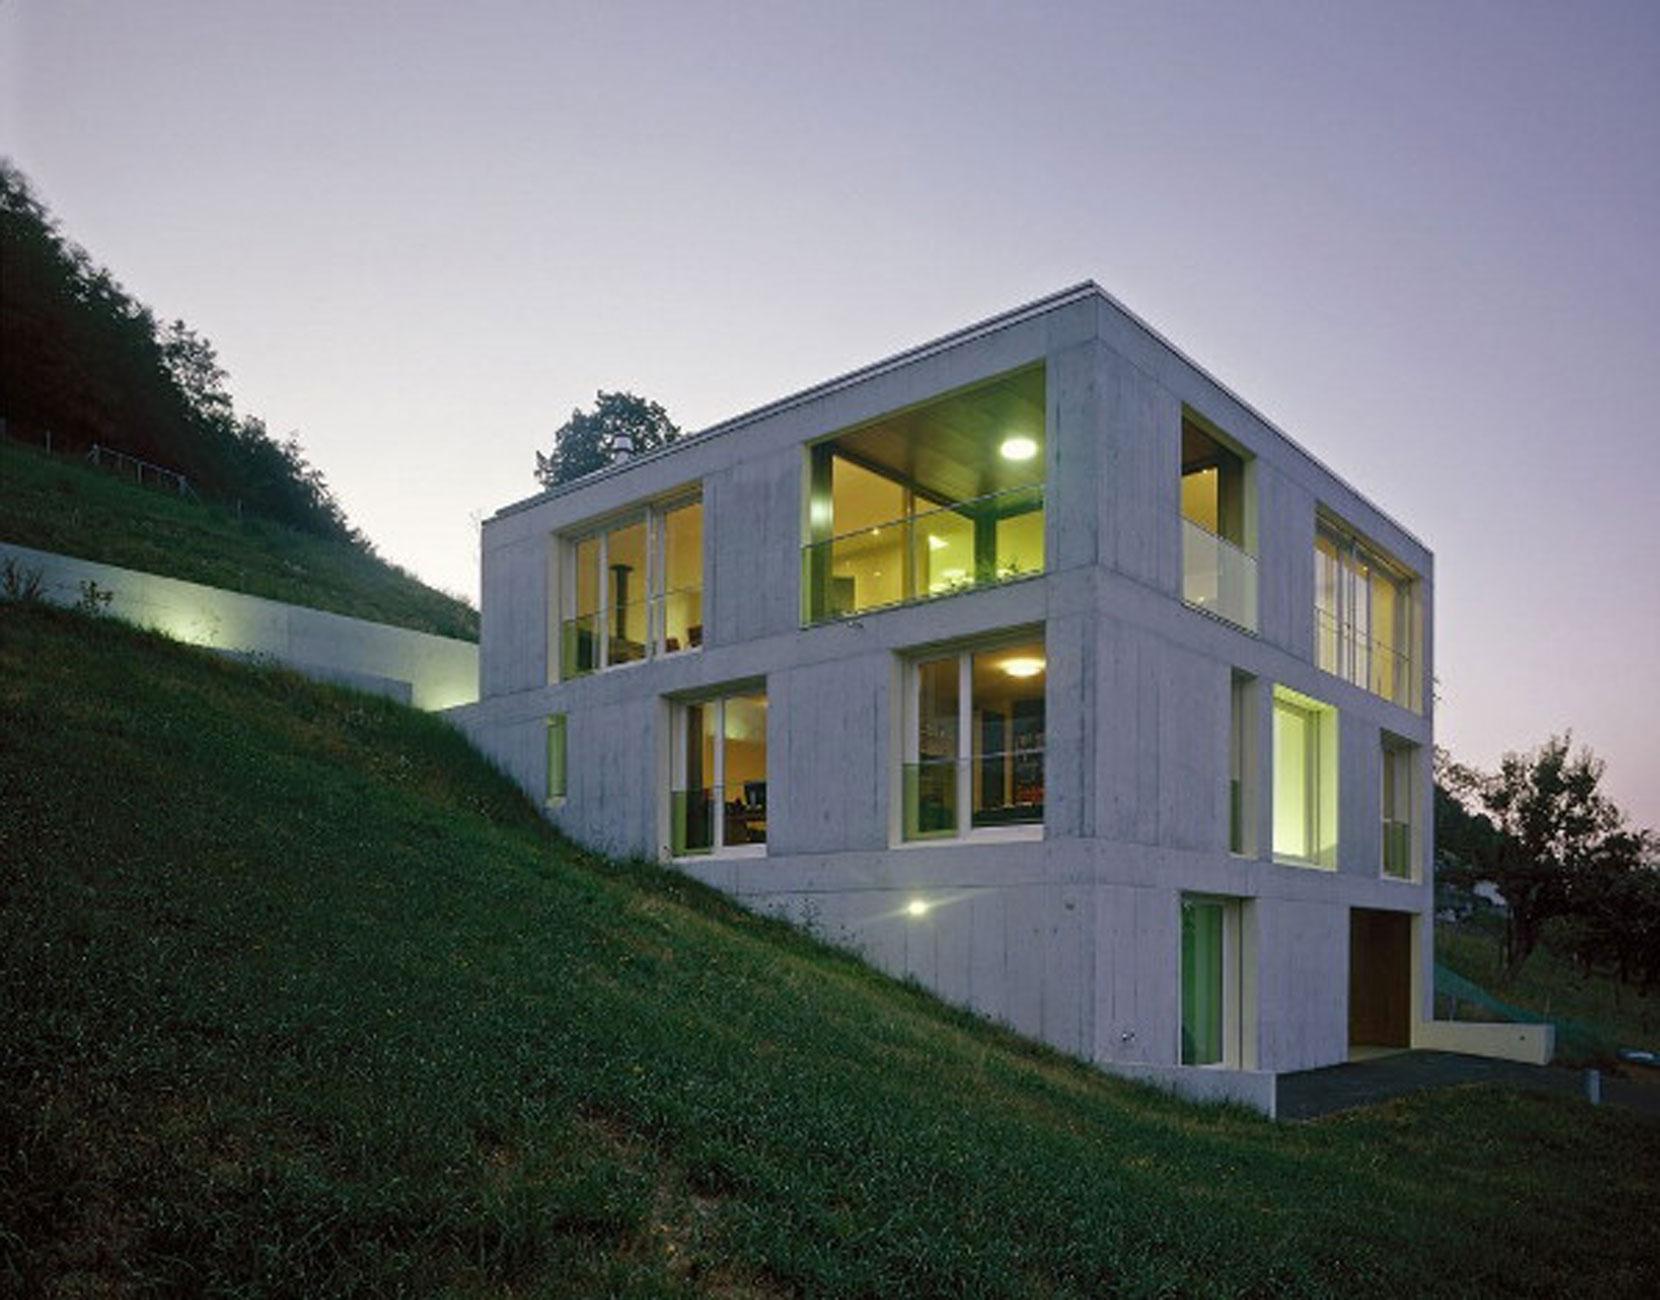 187 Contemporary Concrete House Design In Rural Landscape Of